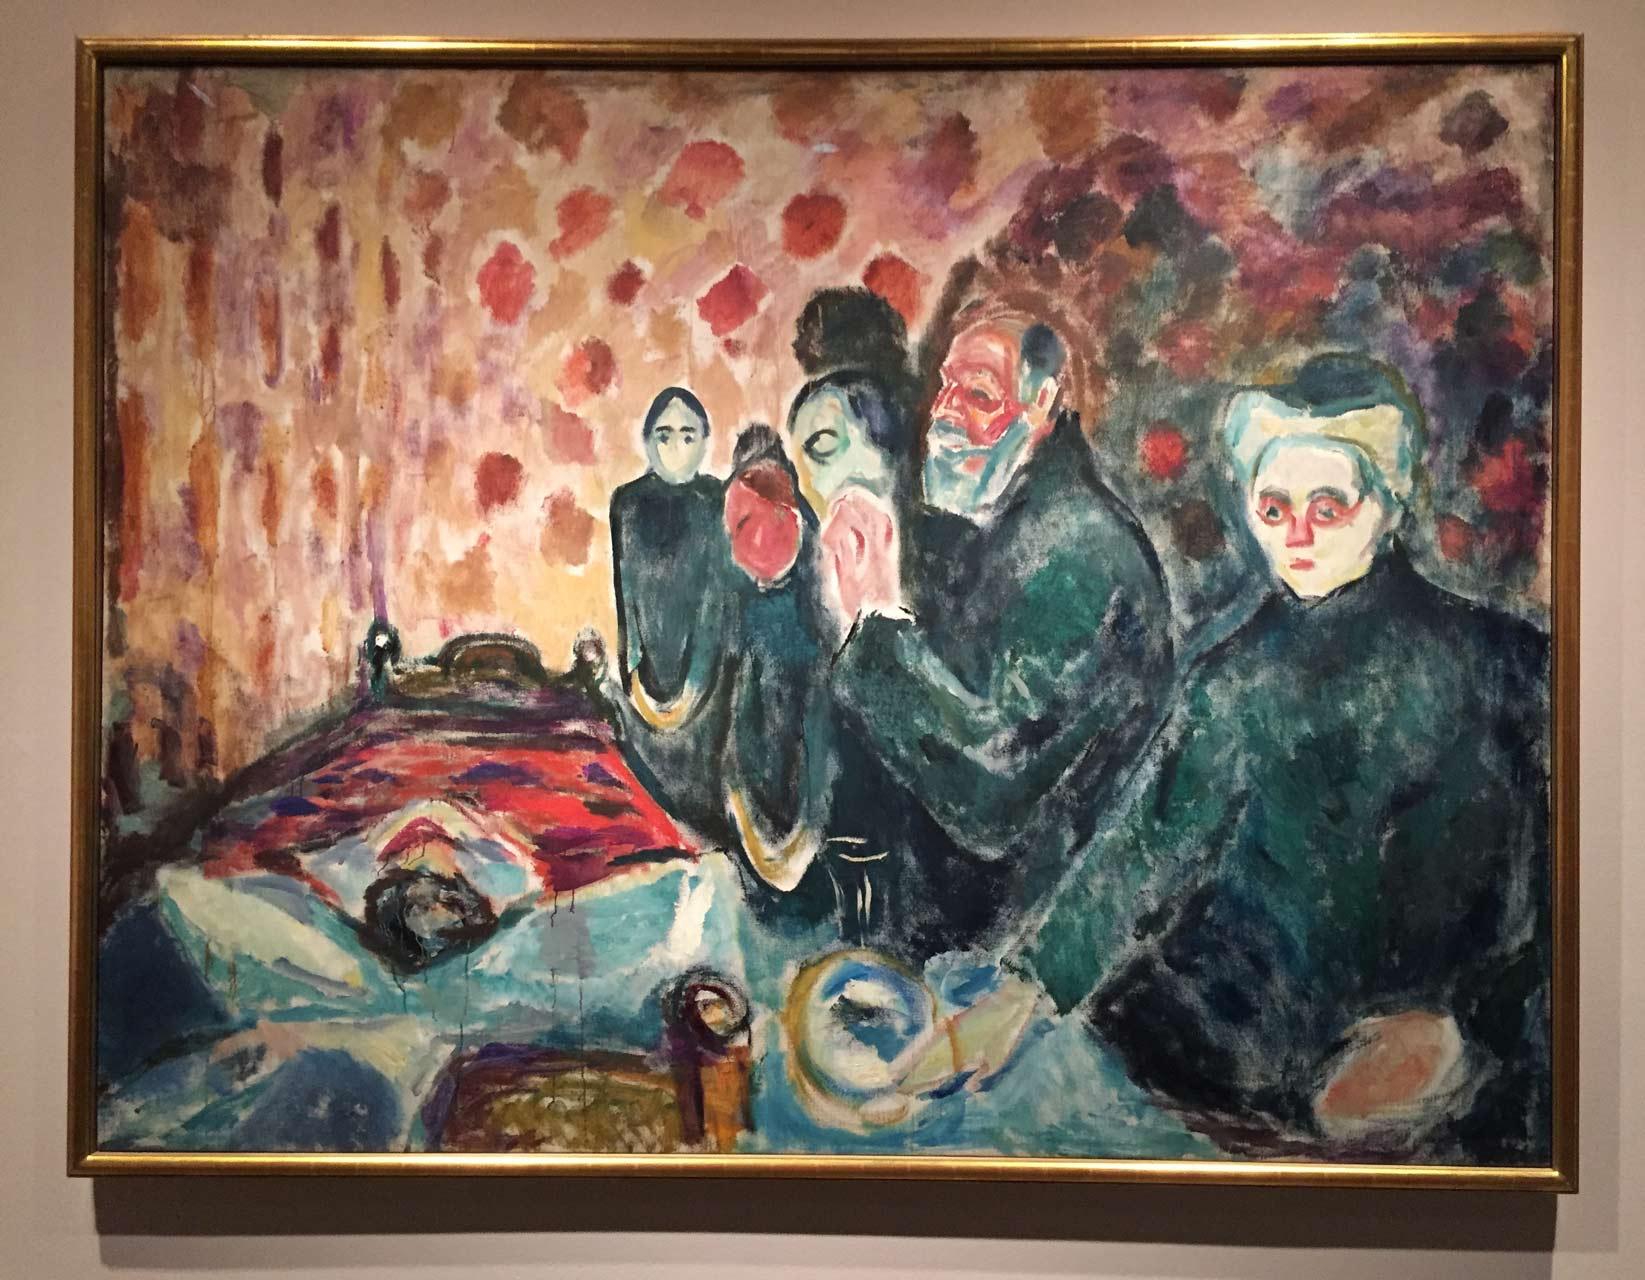 Edvard-Munch-Death-Struggle-1915-Munch-Museum.jpg